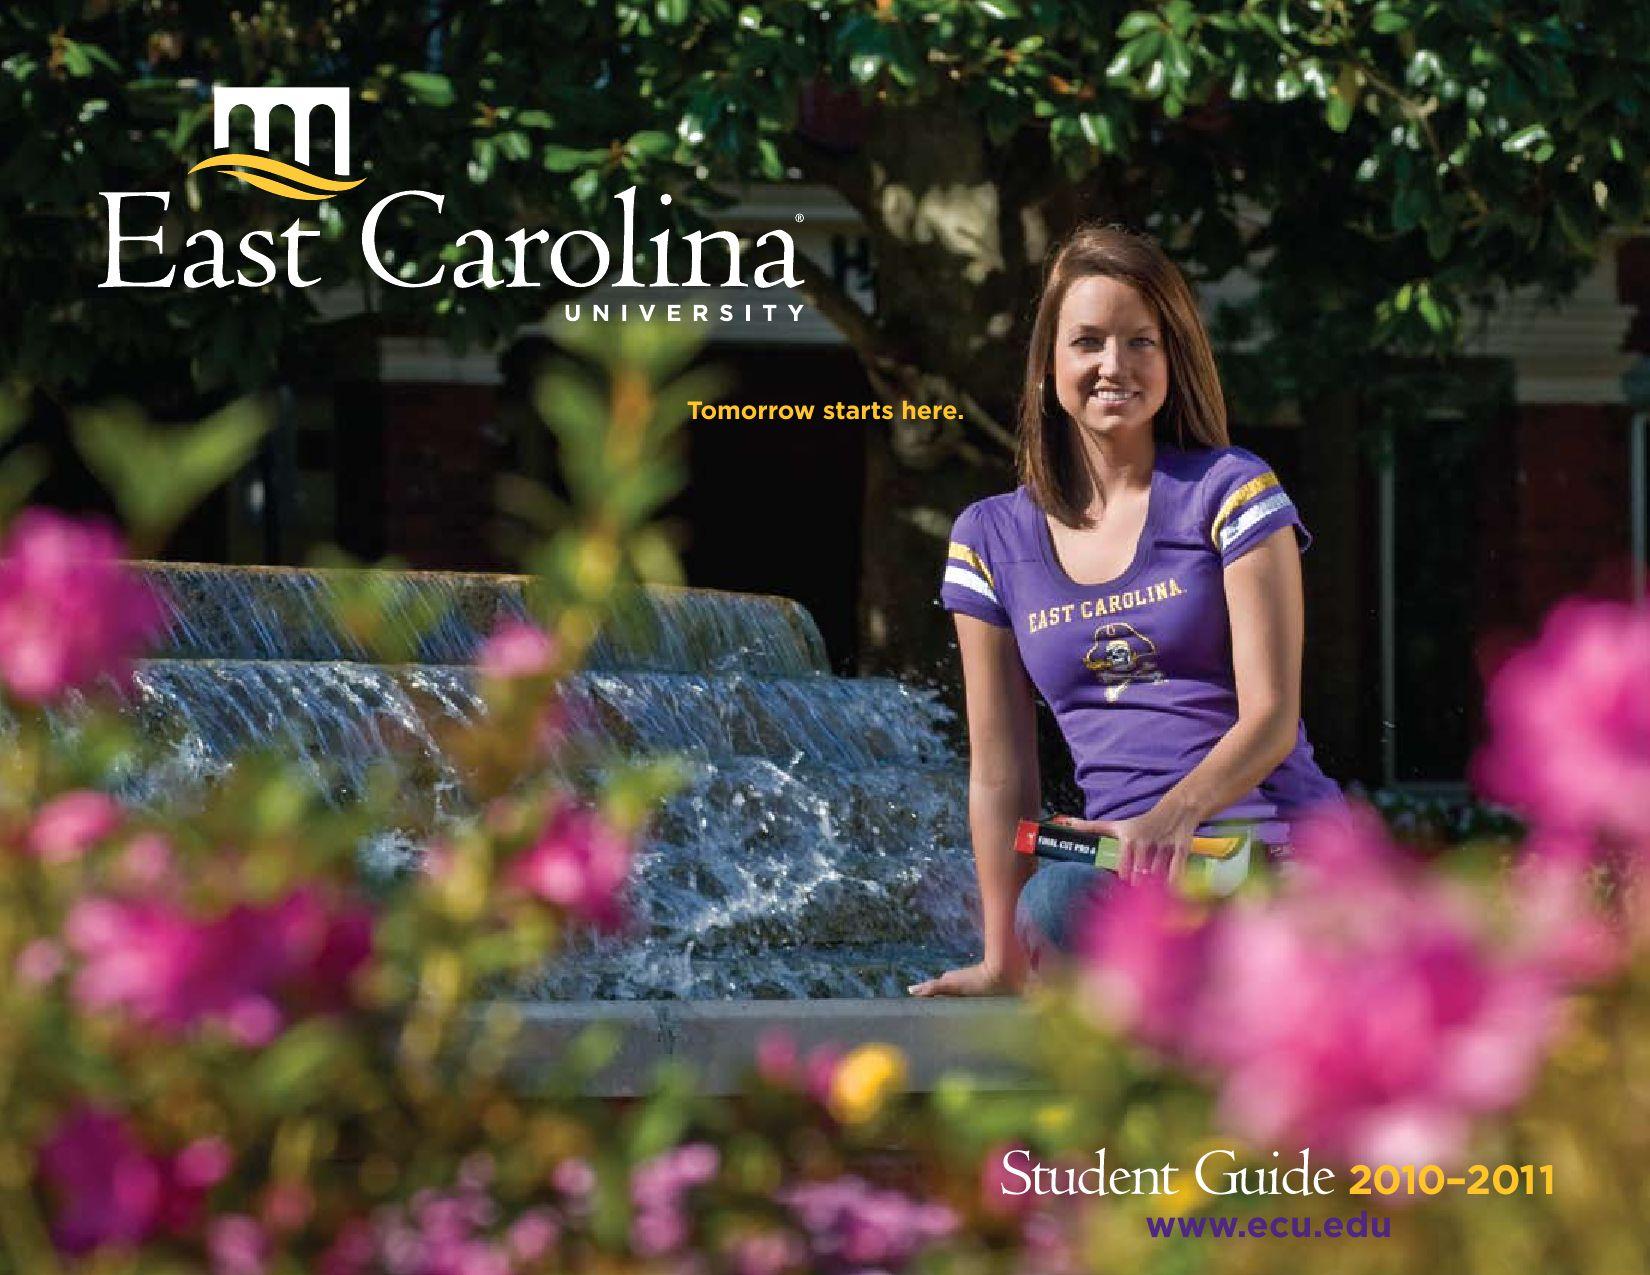 east carolina university application essay Comprehensive information on admission at east carolina university, including admission requirements and deadlines, early and regular admission.